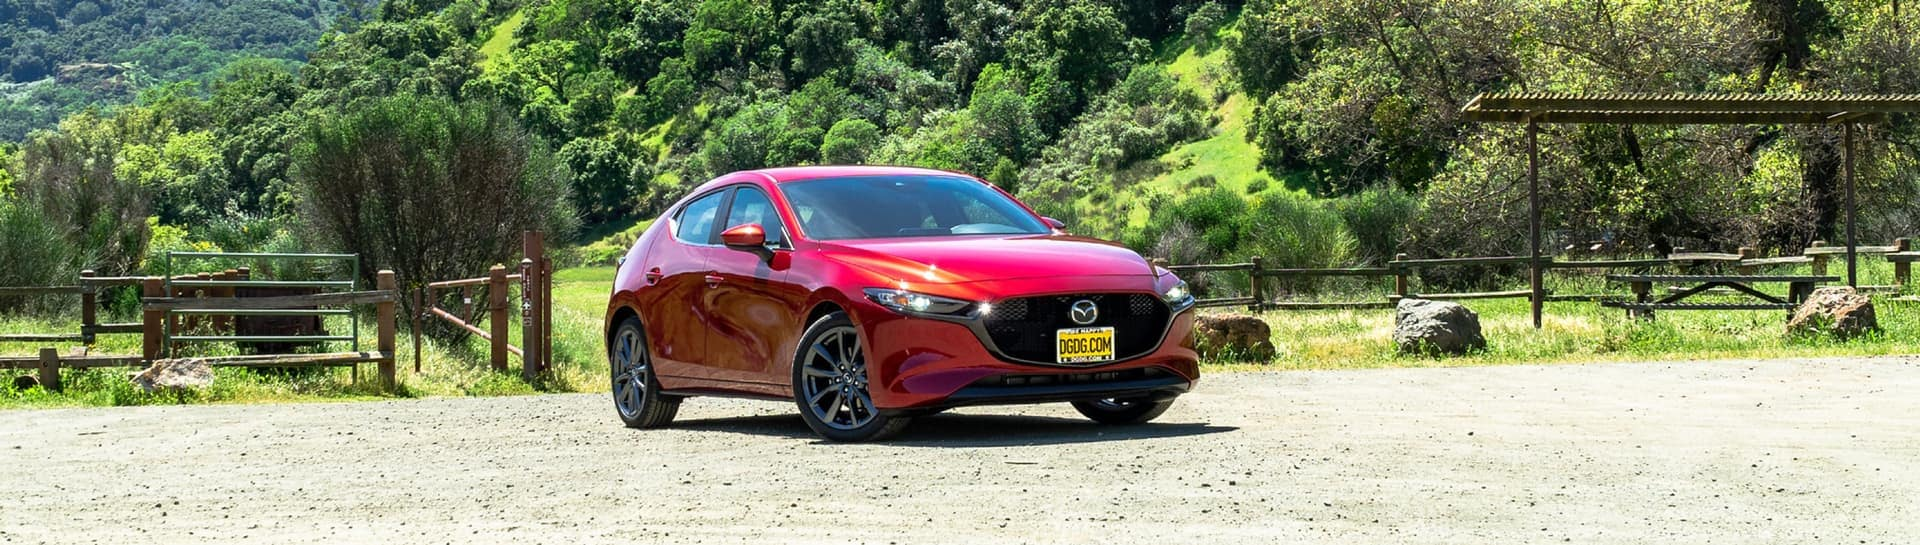 Red Mazda sedan sitting on a gravel road